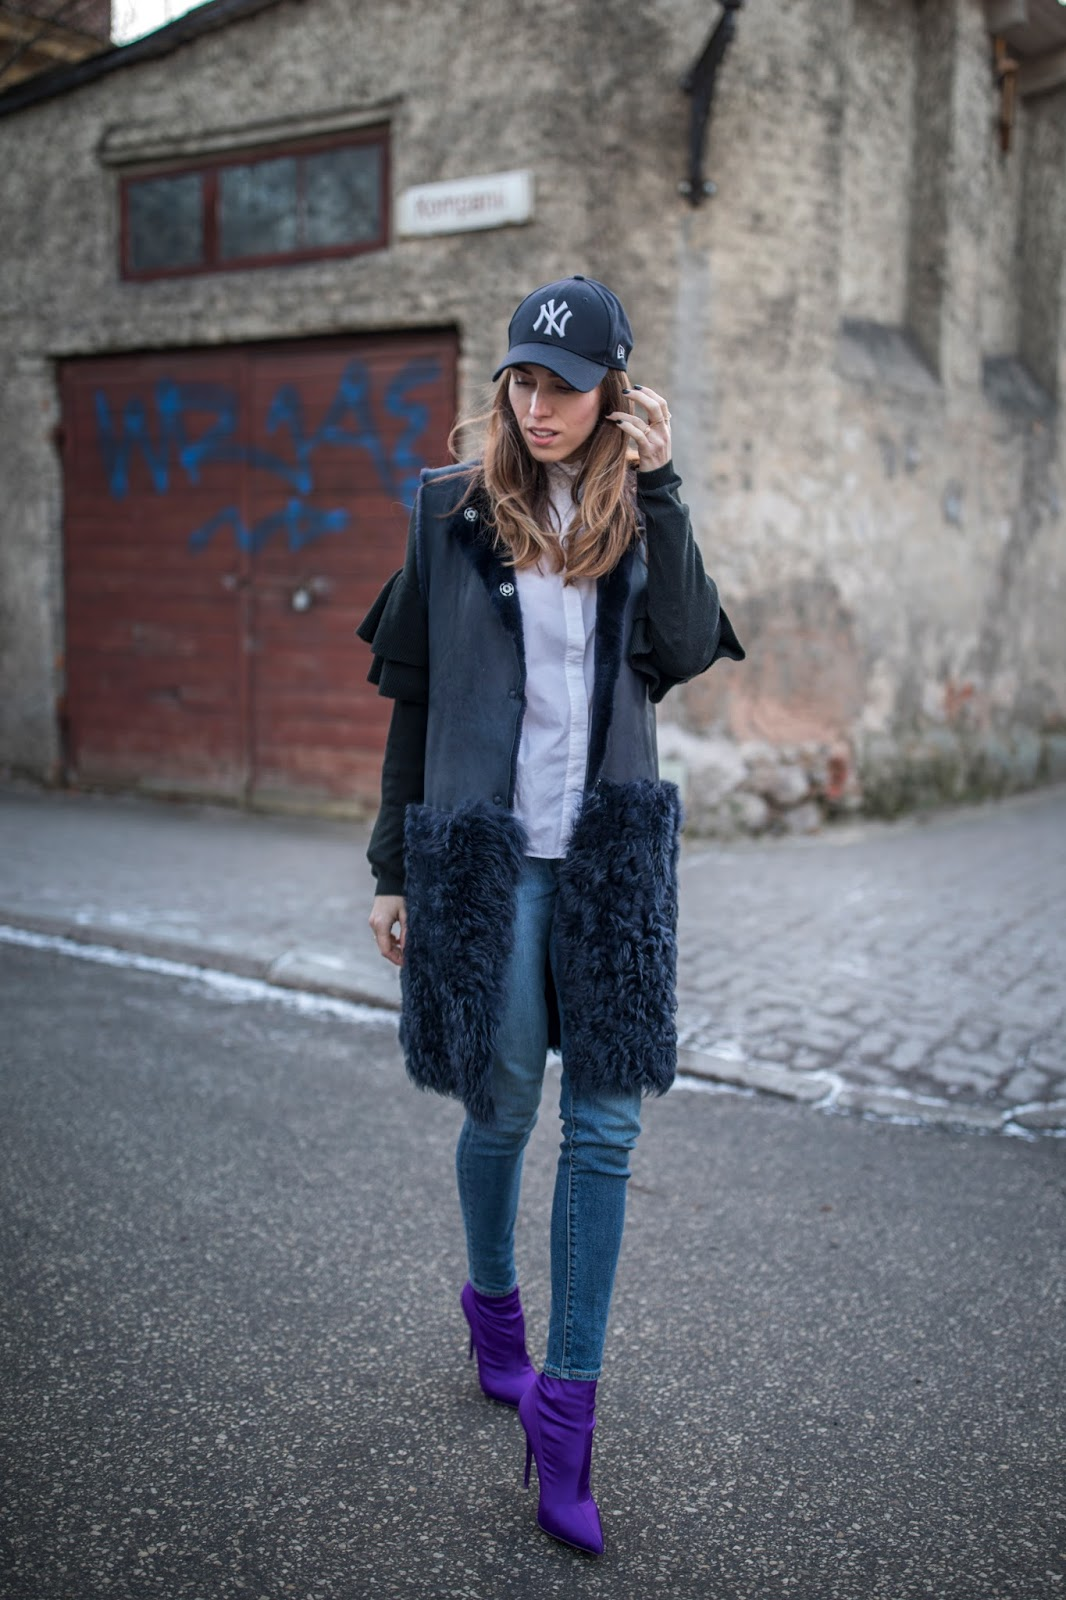 long shearling vest levis jeans purple sock boots outfit